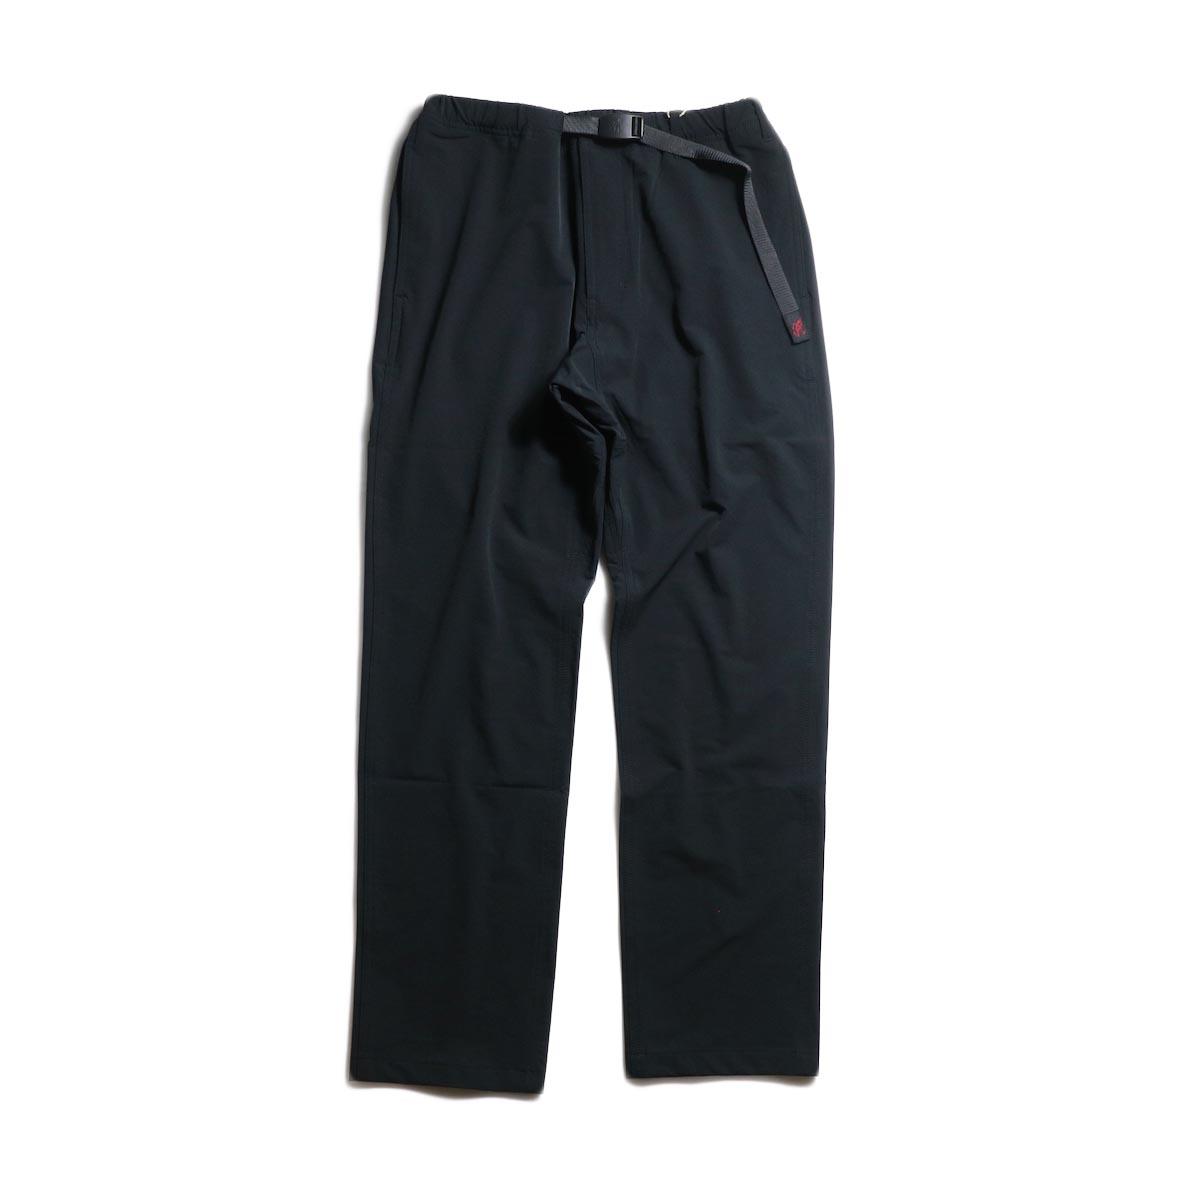 GRAMICCI / 4Way NN-Pant Just Cut -Black